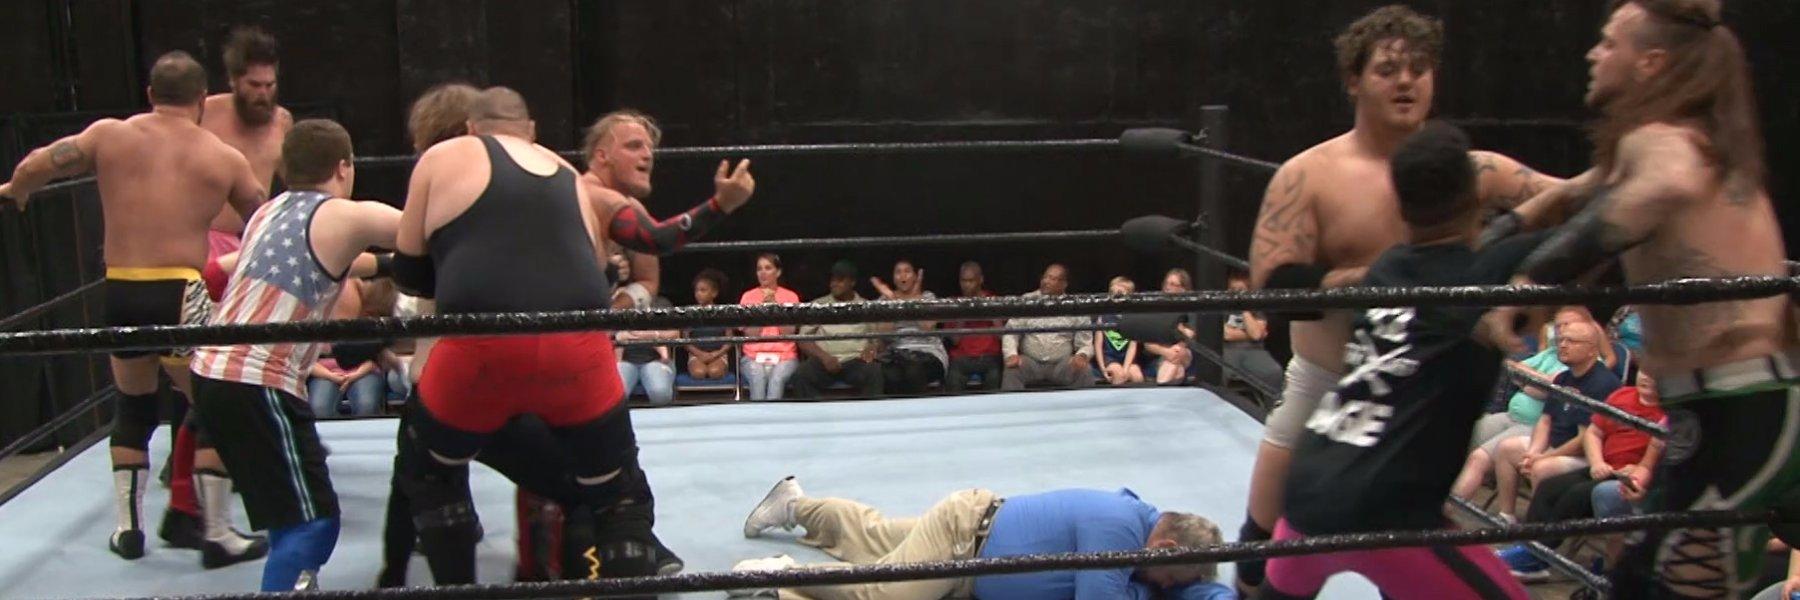 USA Championship Wrestling Prime